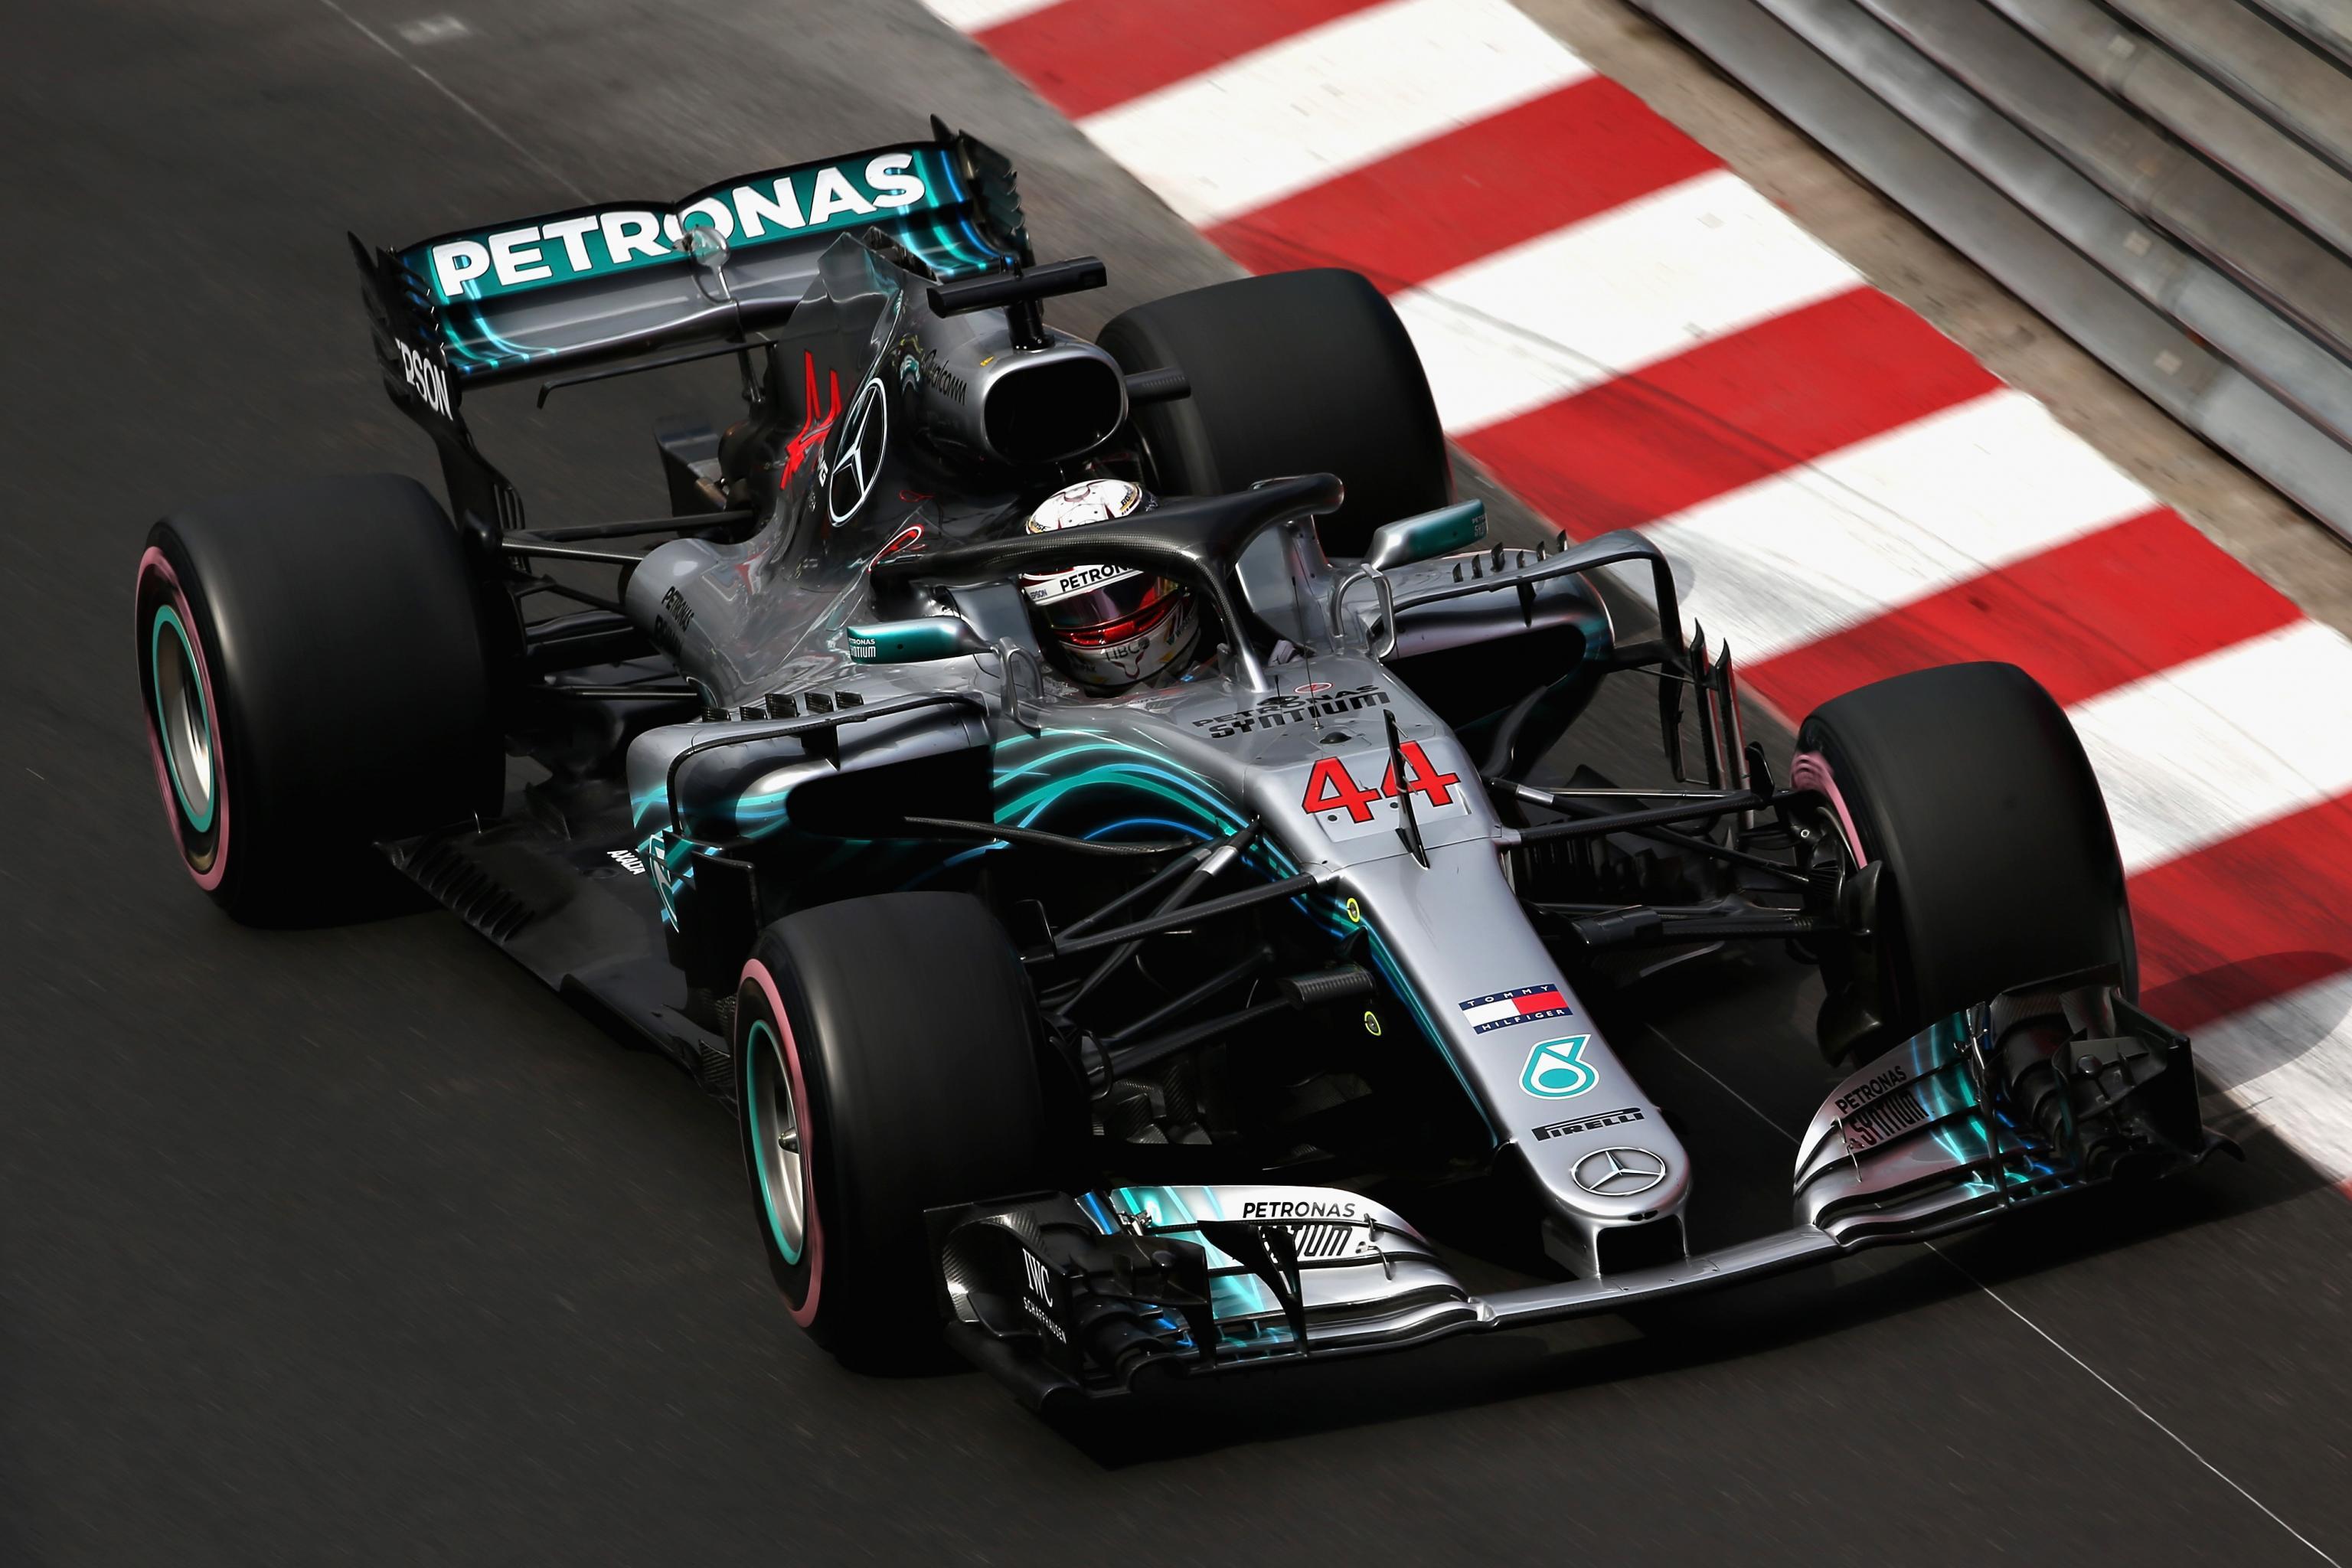 Monaco F1 Grand Prix 2018: Start Time, Drivers, TV Schedule